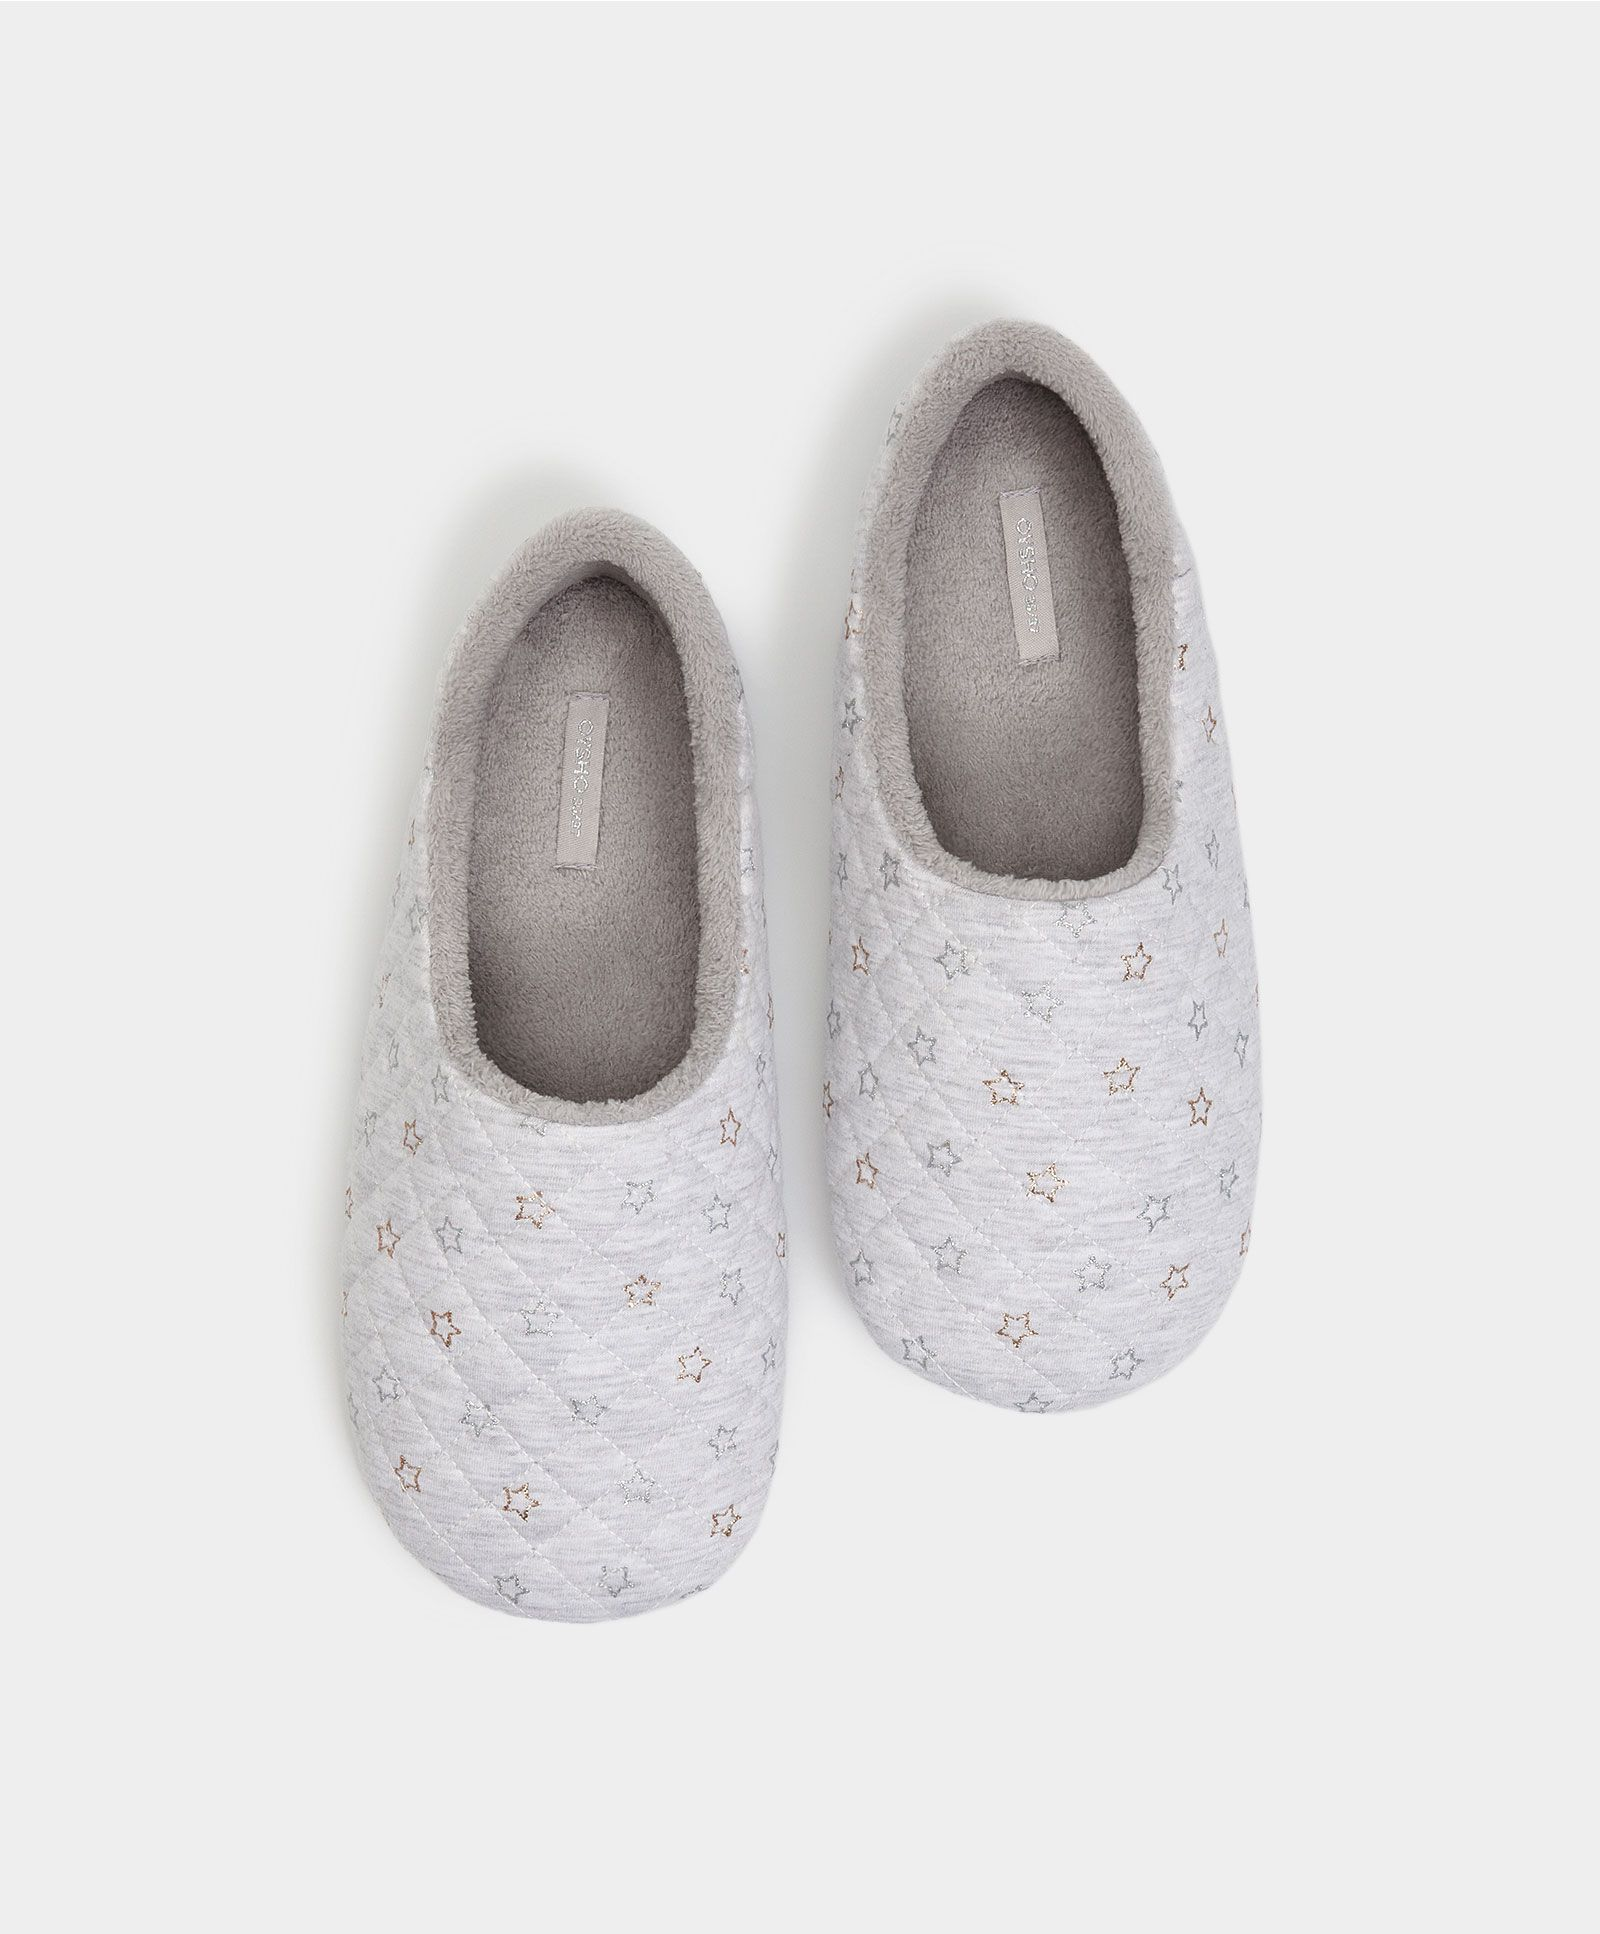 d89a2daa5f Metallic stars slippers - FOOTWEAR   Oysho España - Canarias ...